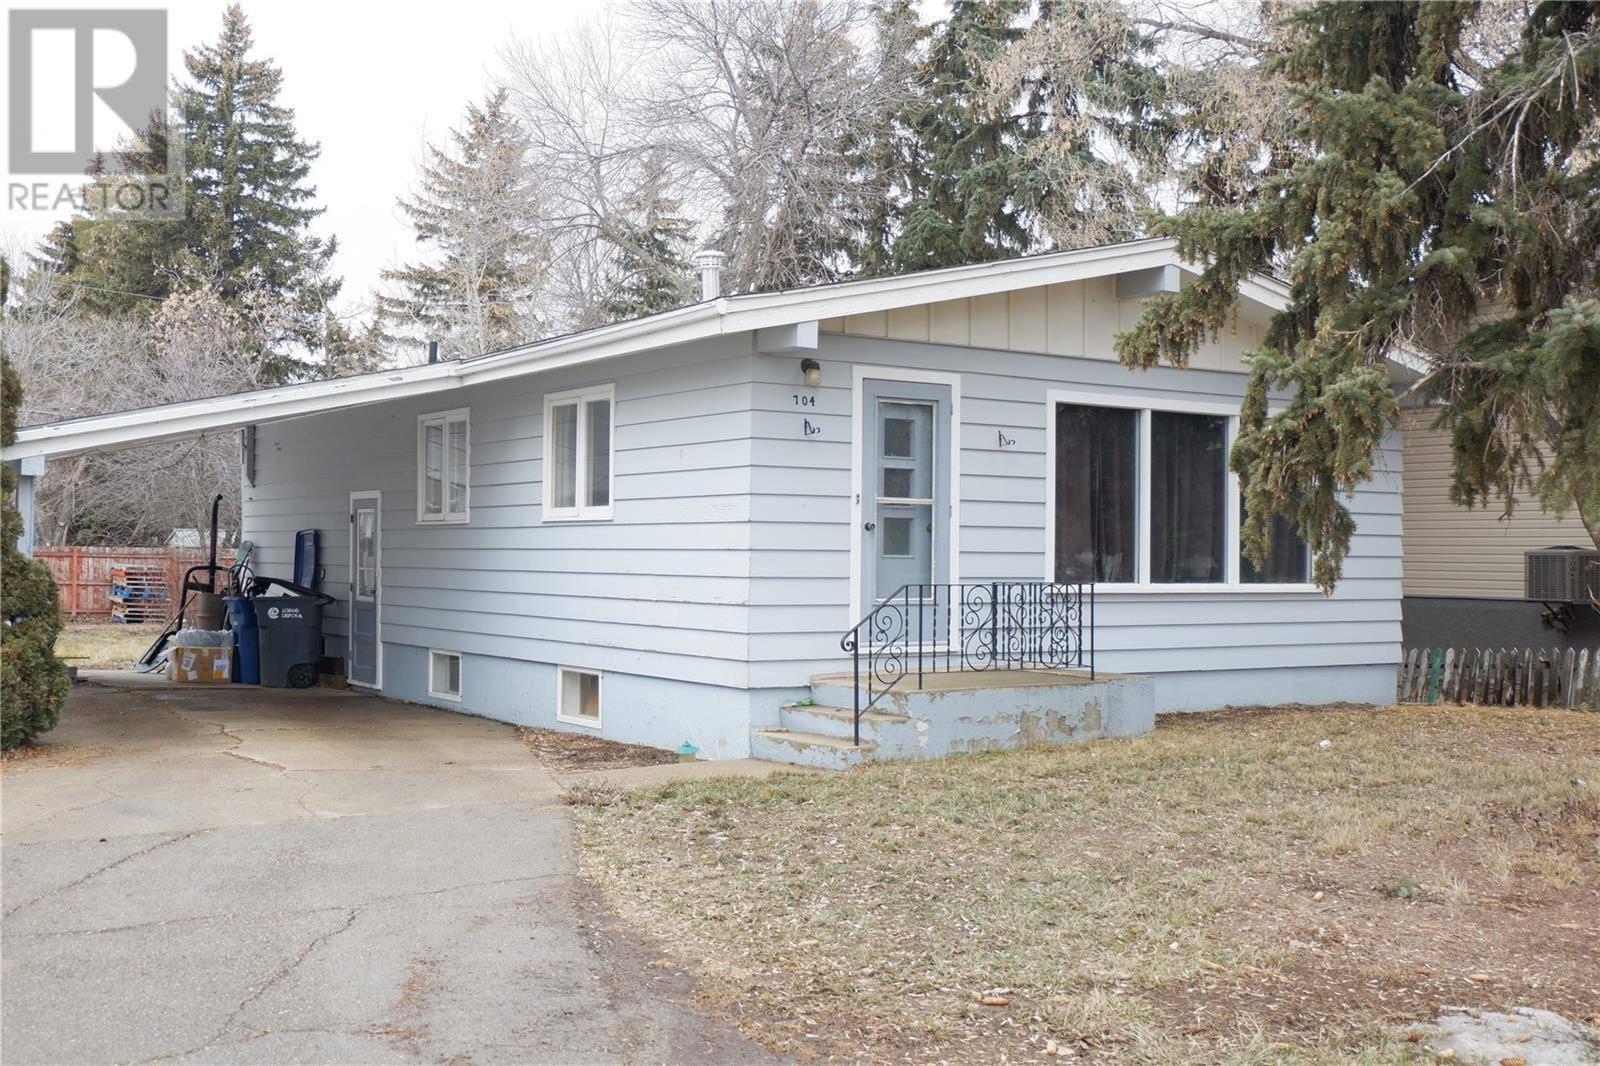 House for sale at 704 4th St E Assiniboia Saskatchewan - MLS: SK759743